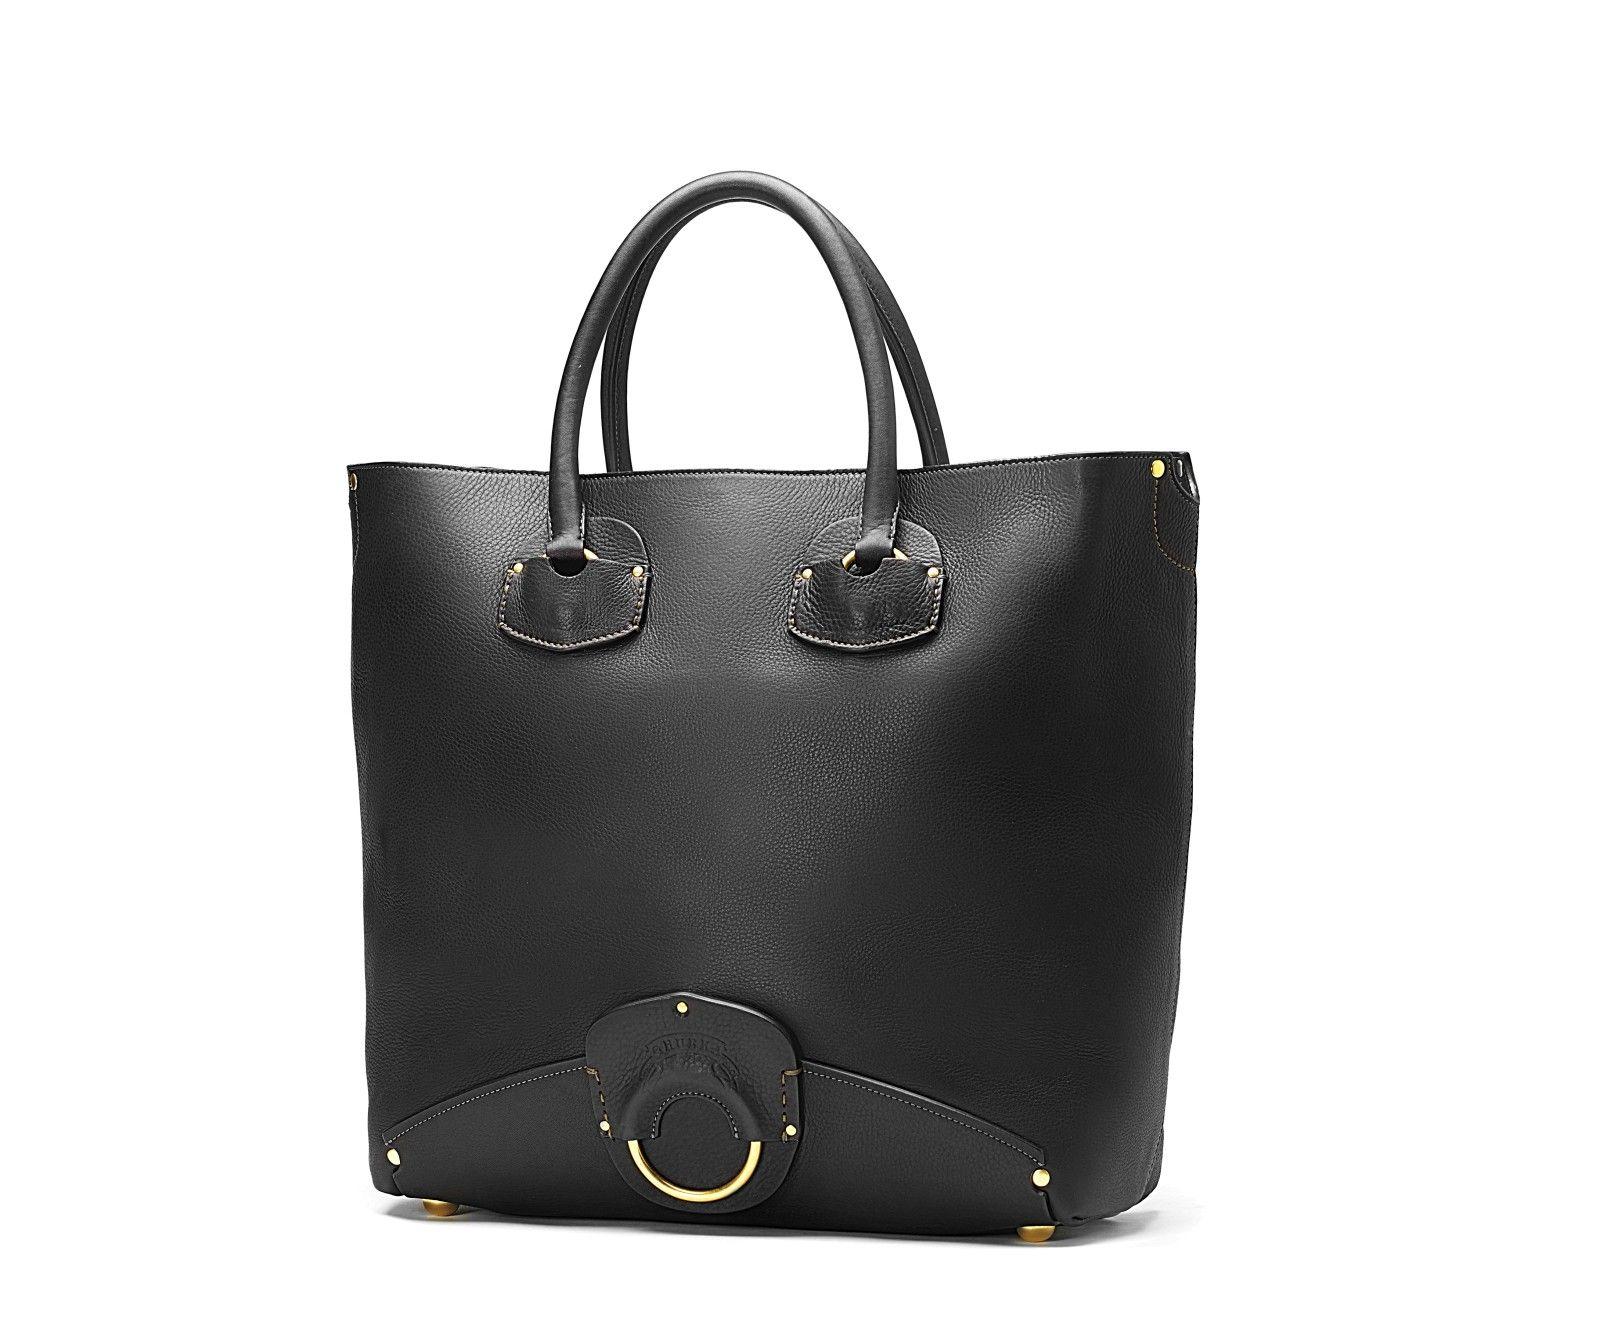 Miansai Launches Men's Bag Line For AutumnWinter 2015 Miansai Launches Men's Bag Line For AutumnWinter 2015 new picture